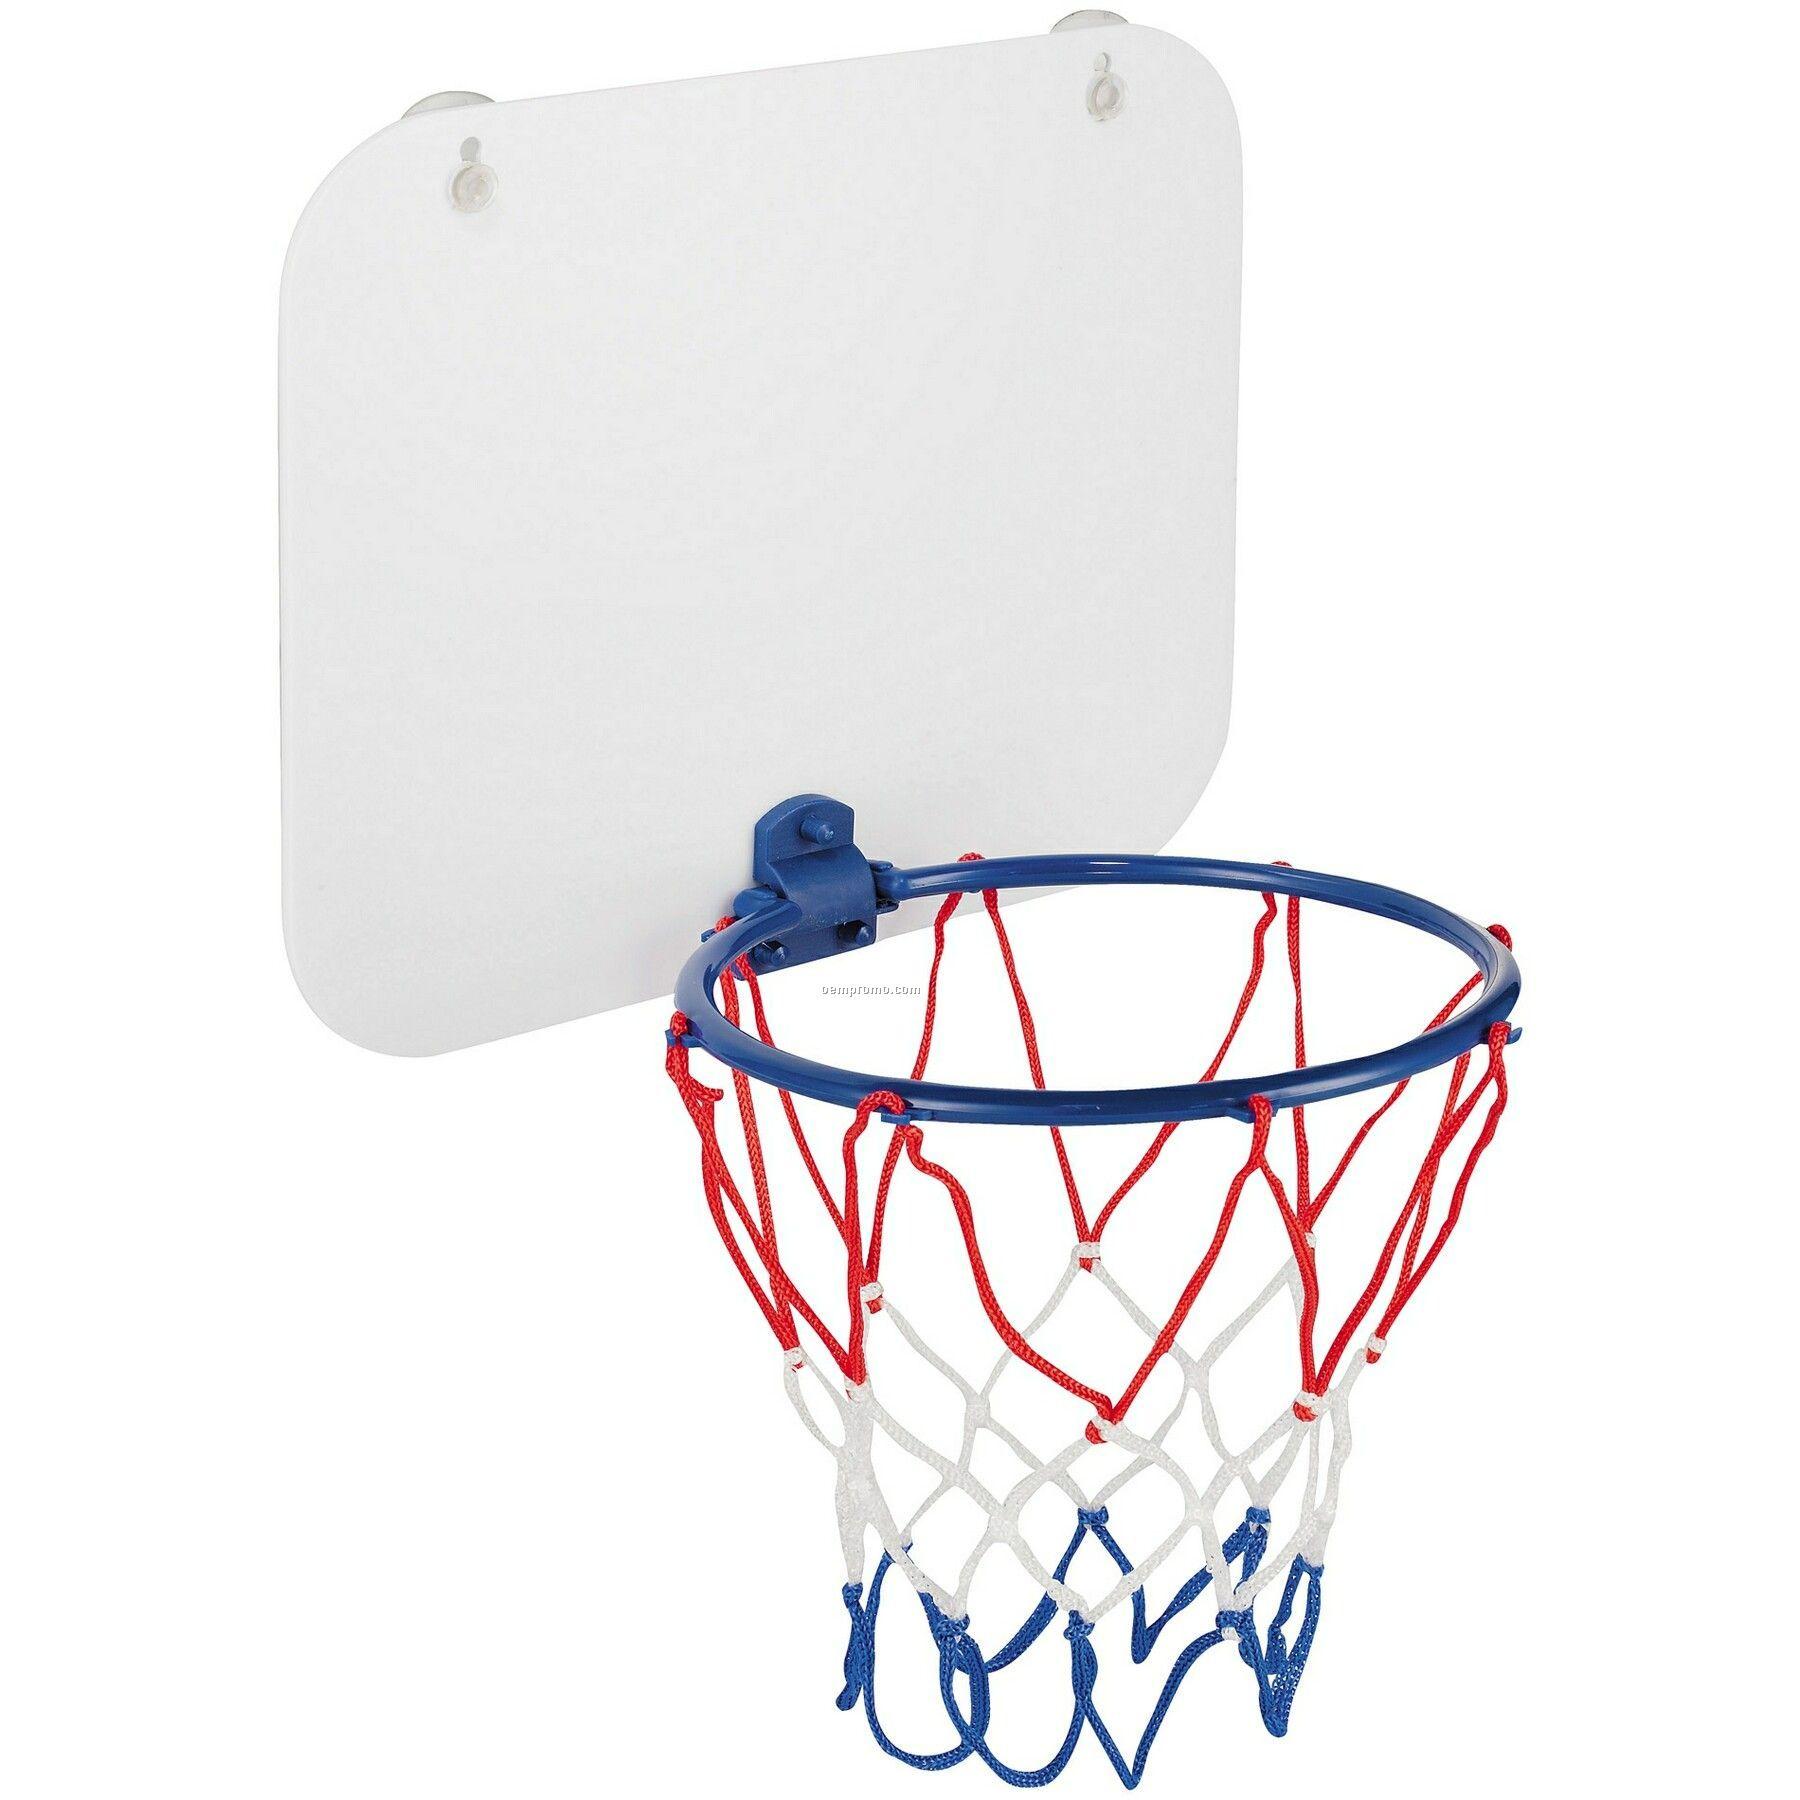 Small Toy Basketball : Hoops basketball set china wholesale